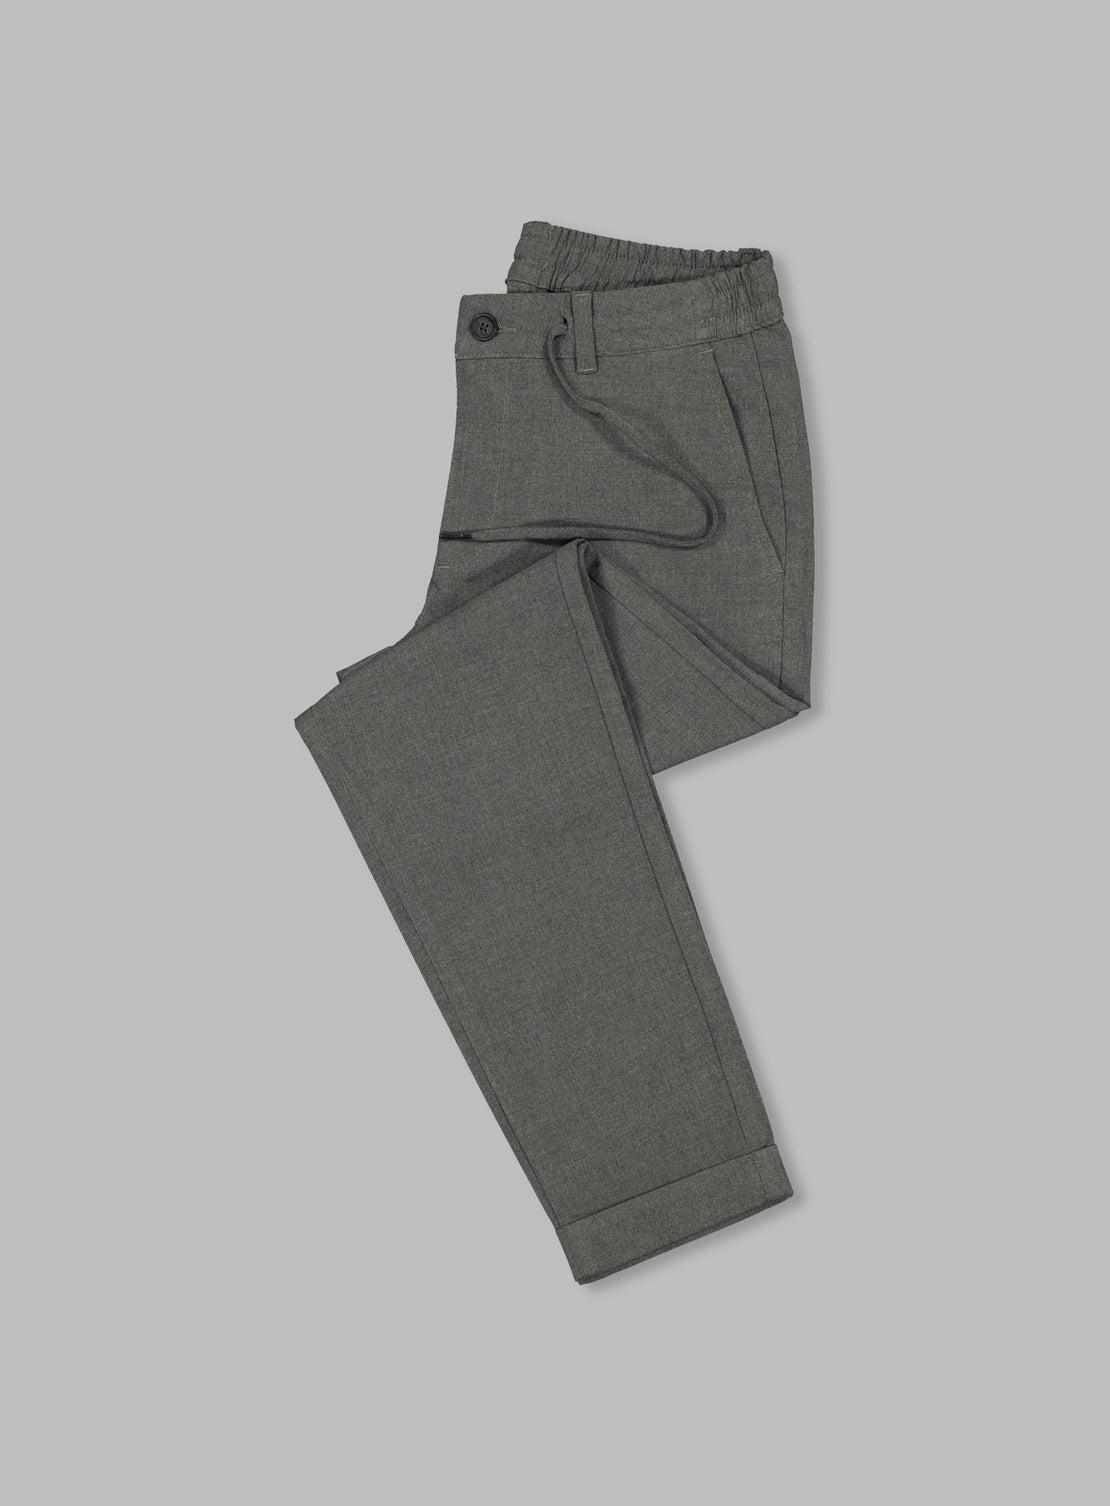 Dusty Grey Drawstring Trouser